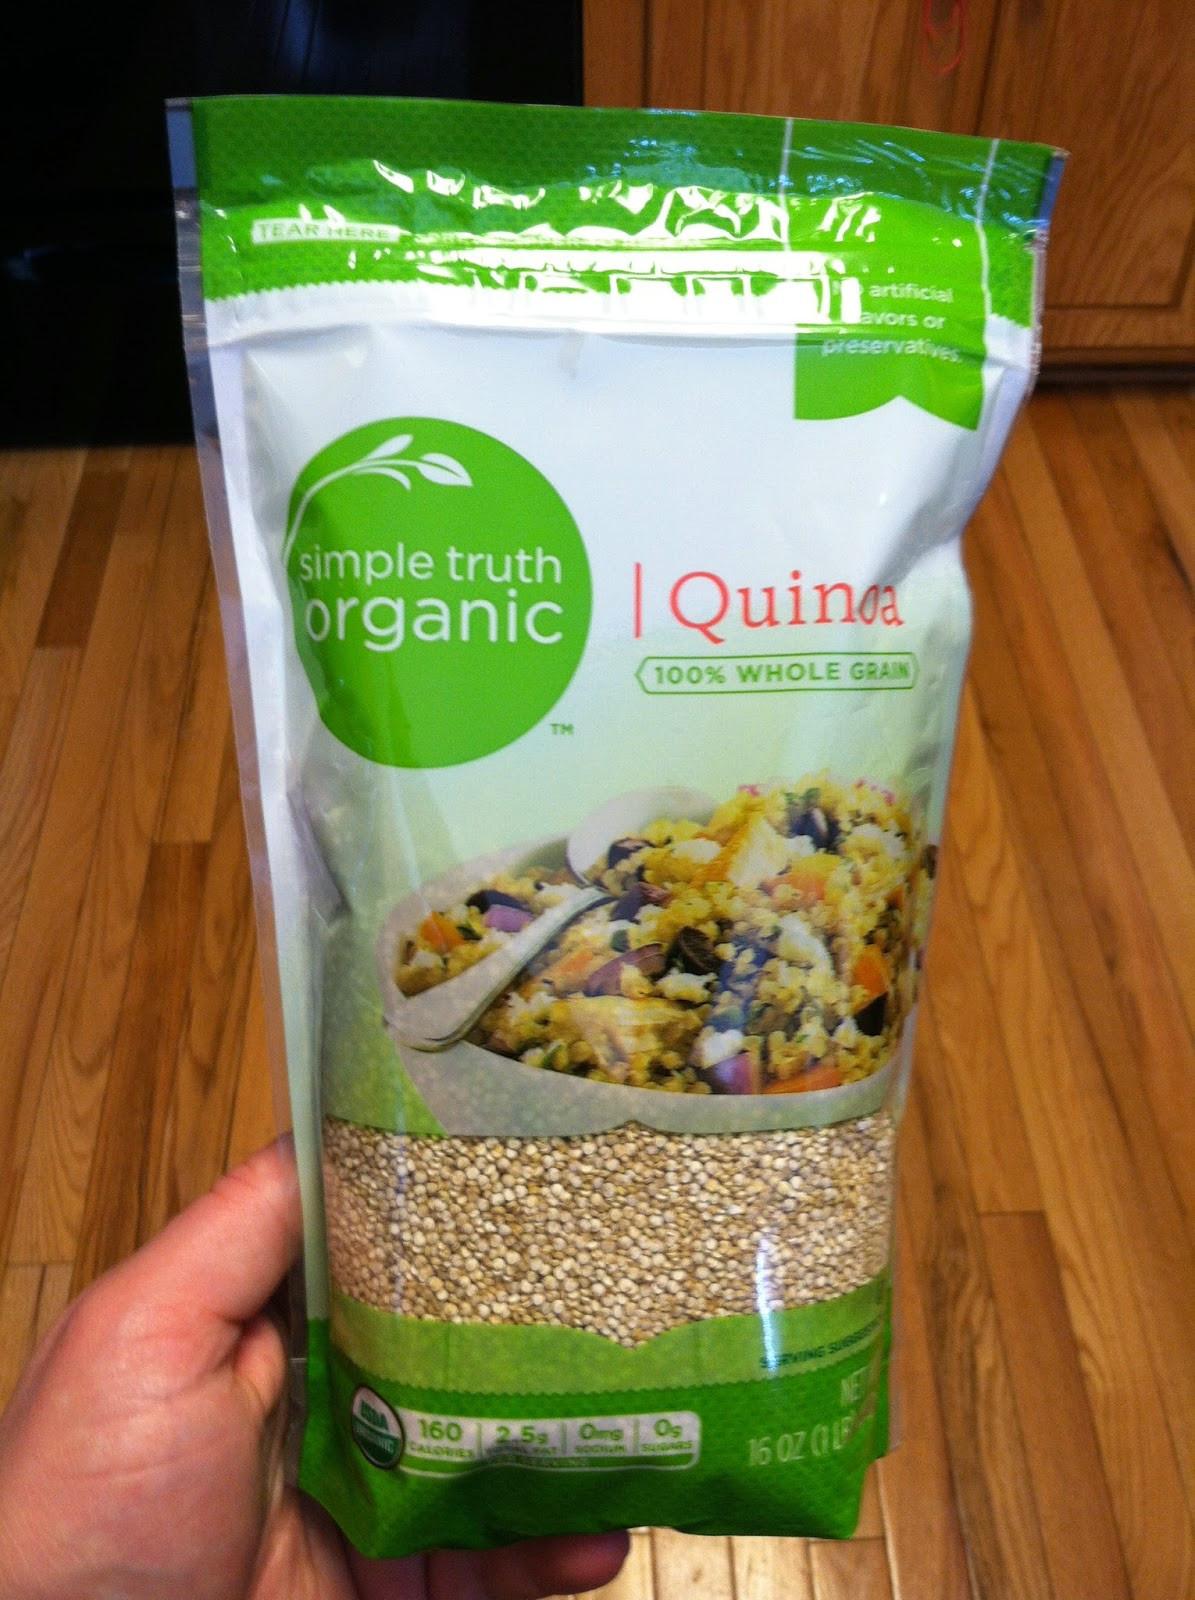 Simple Truth Organic Quinoa  No apologies gluten free Gluten free Kroger